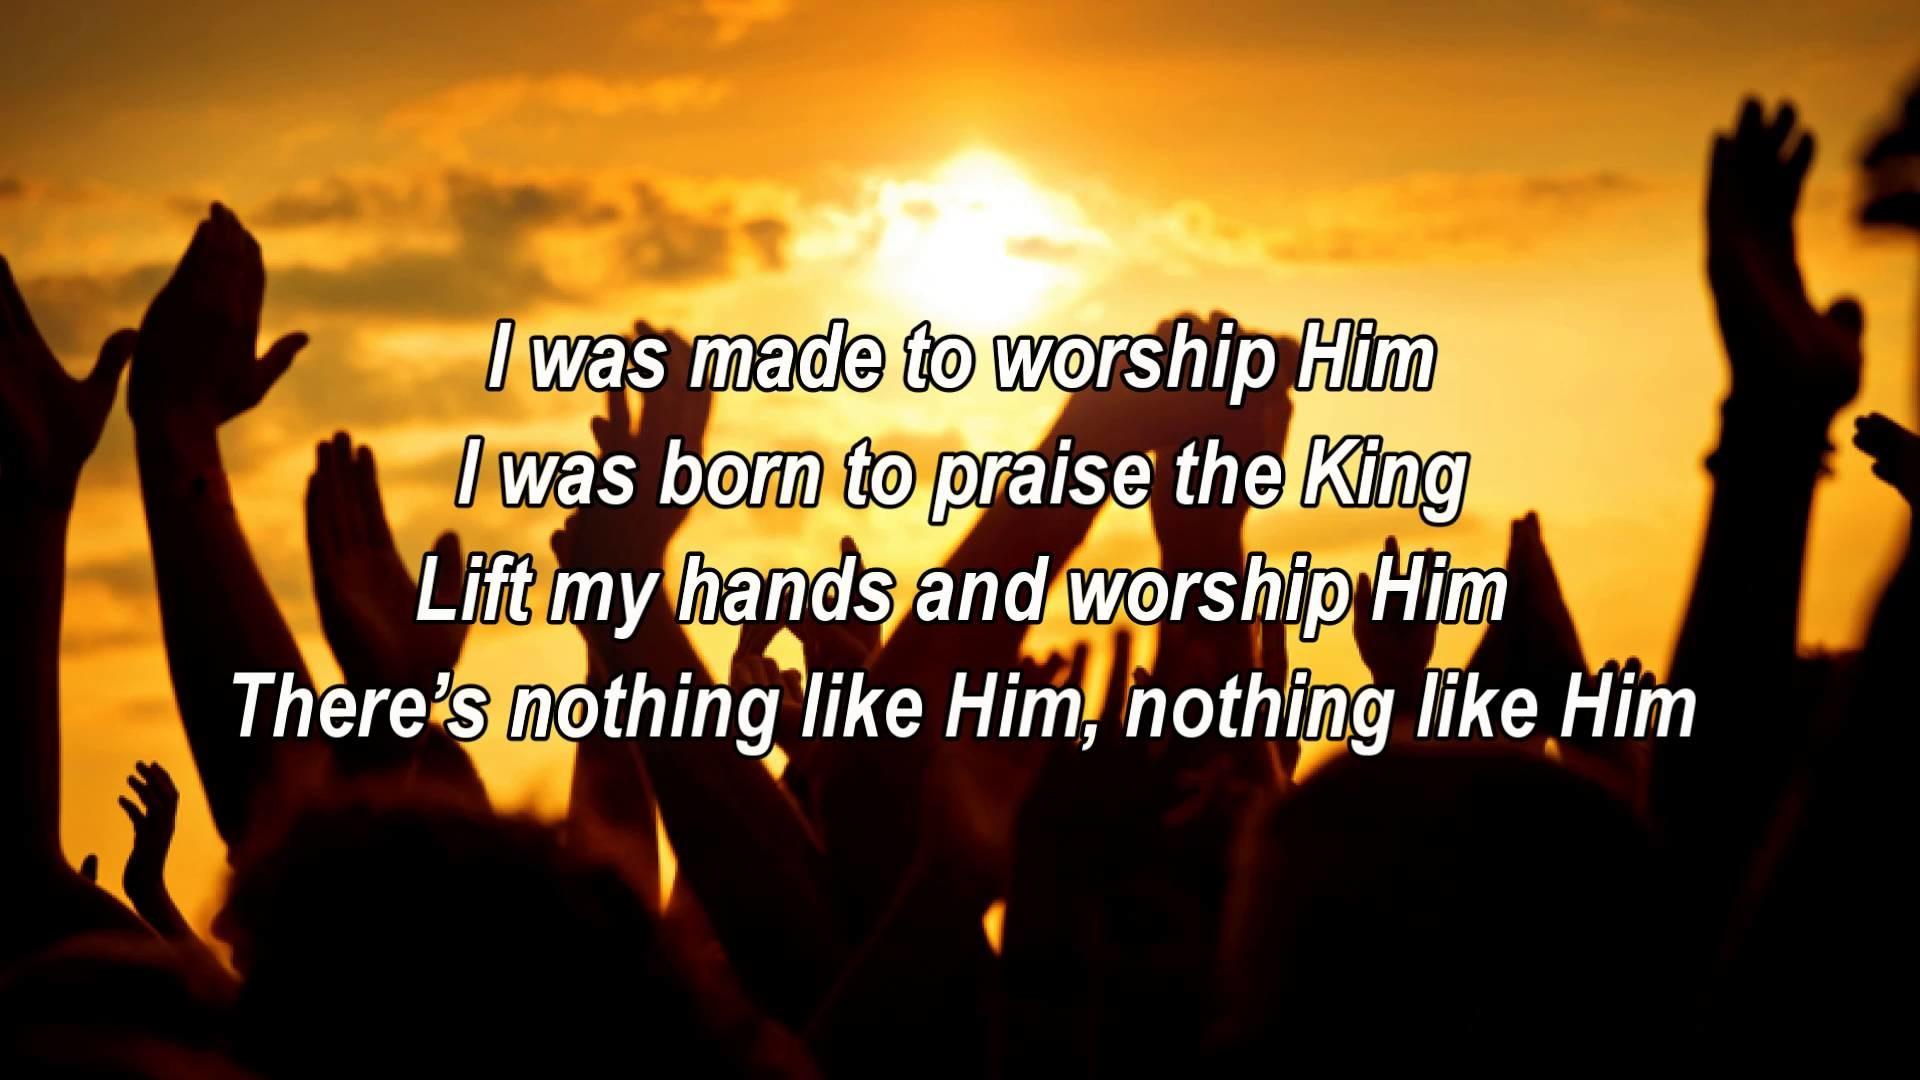 Born To Praise – Planetshakers (2015 New Worship Song with Lyrics) – YouTube